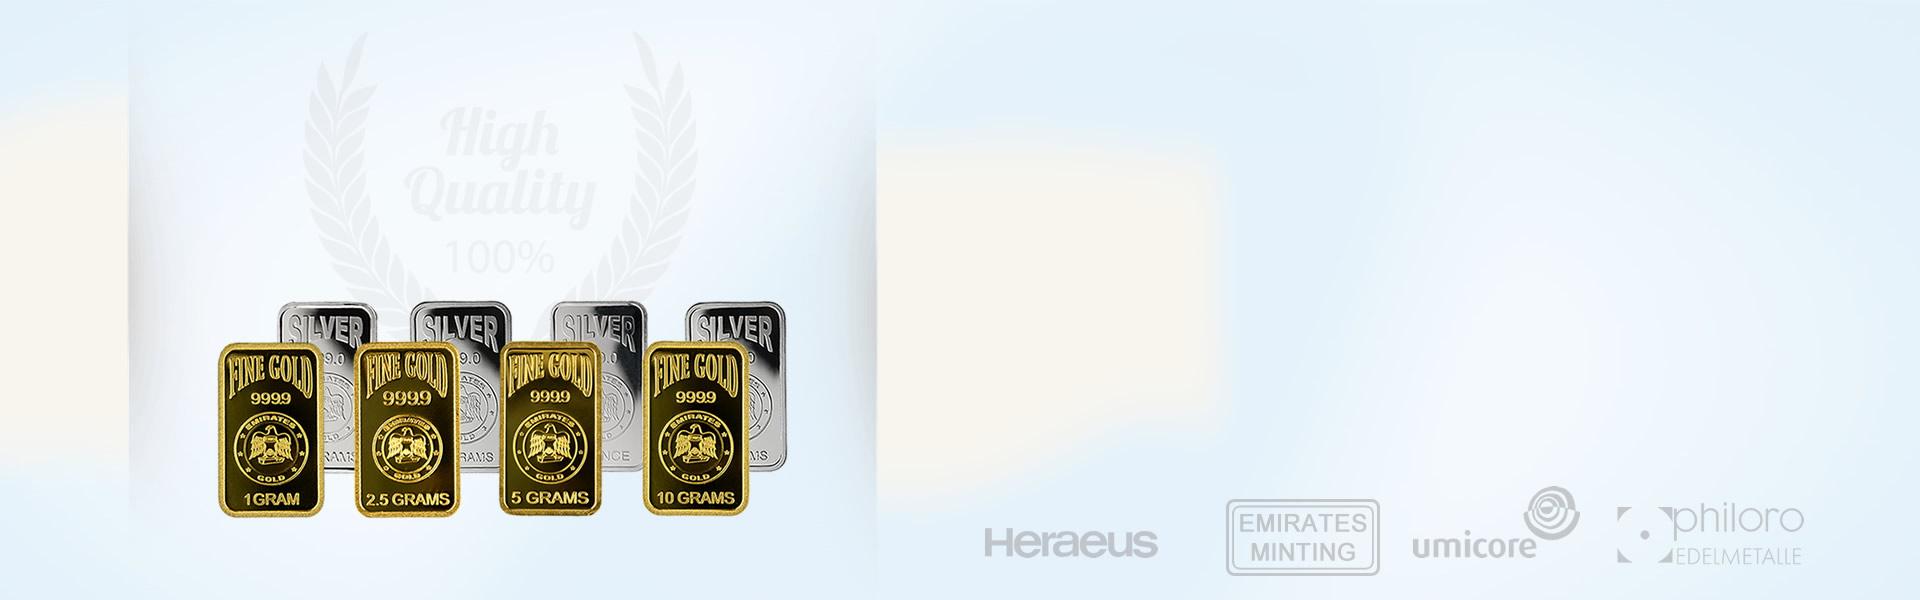 MG-Edelmetalle.com | Unsere Edelmetalle Gold & Silber!